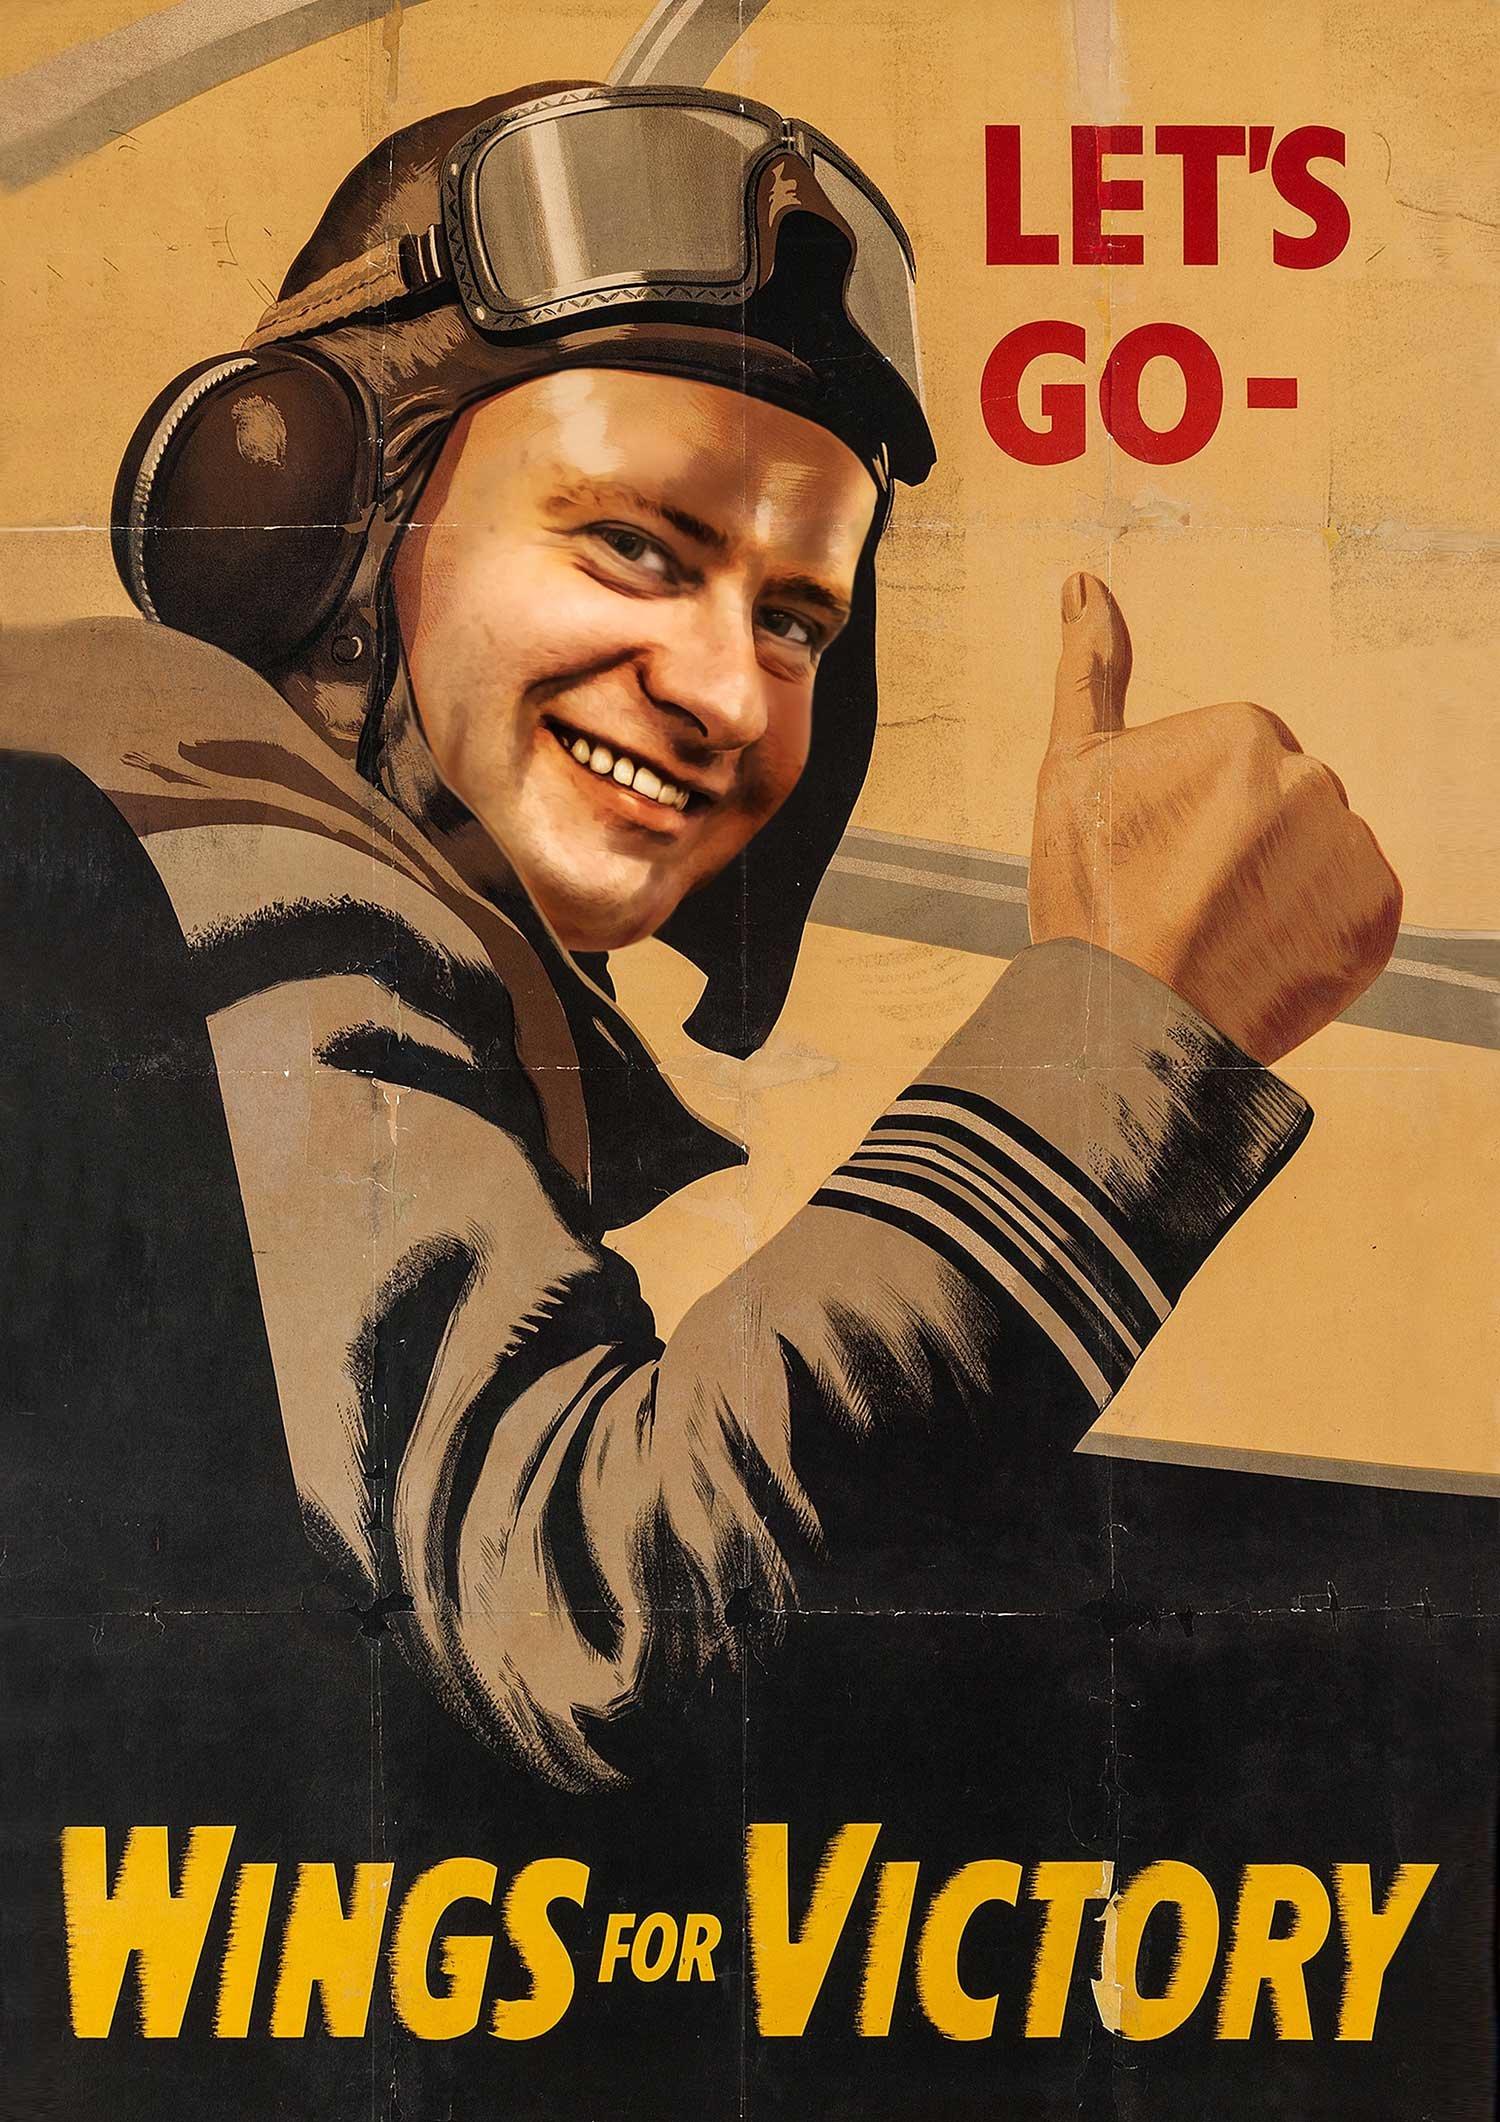 Johan-Poster